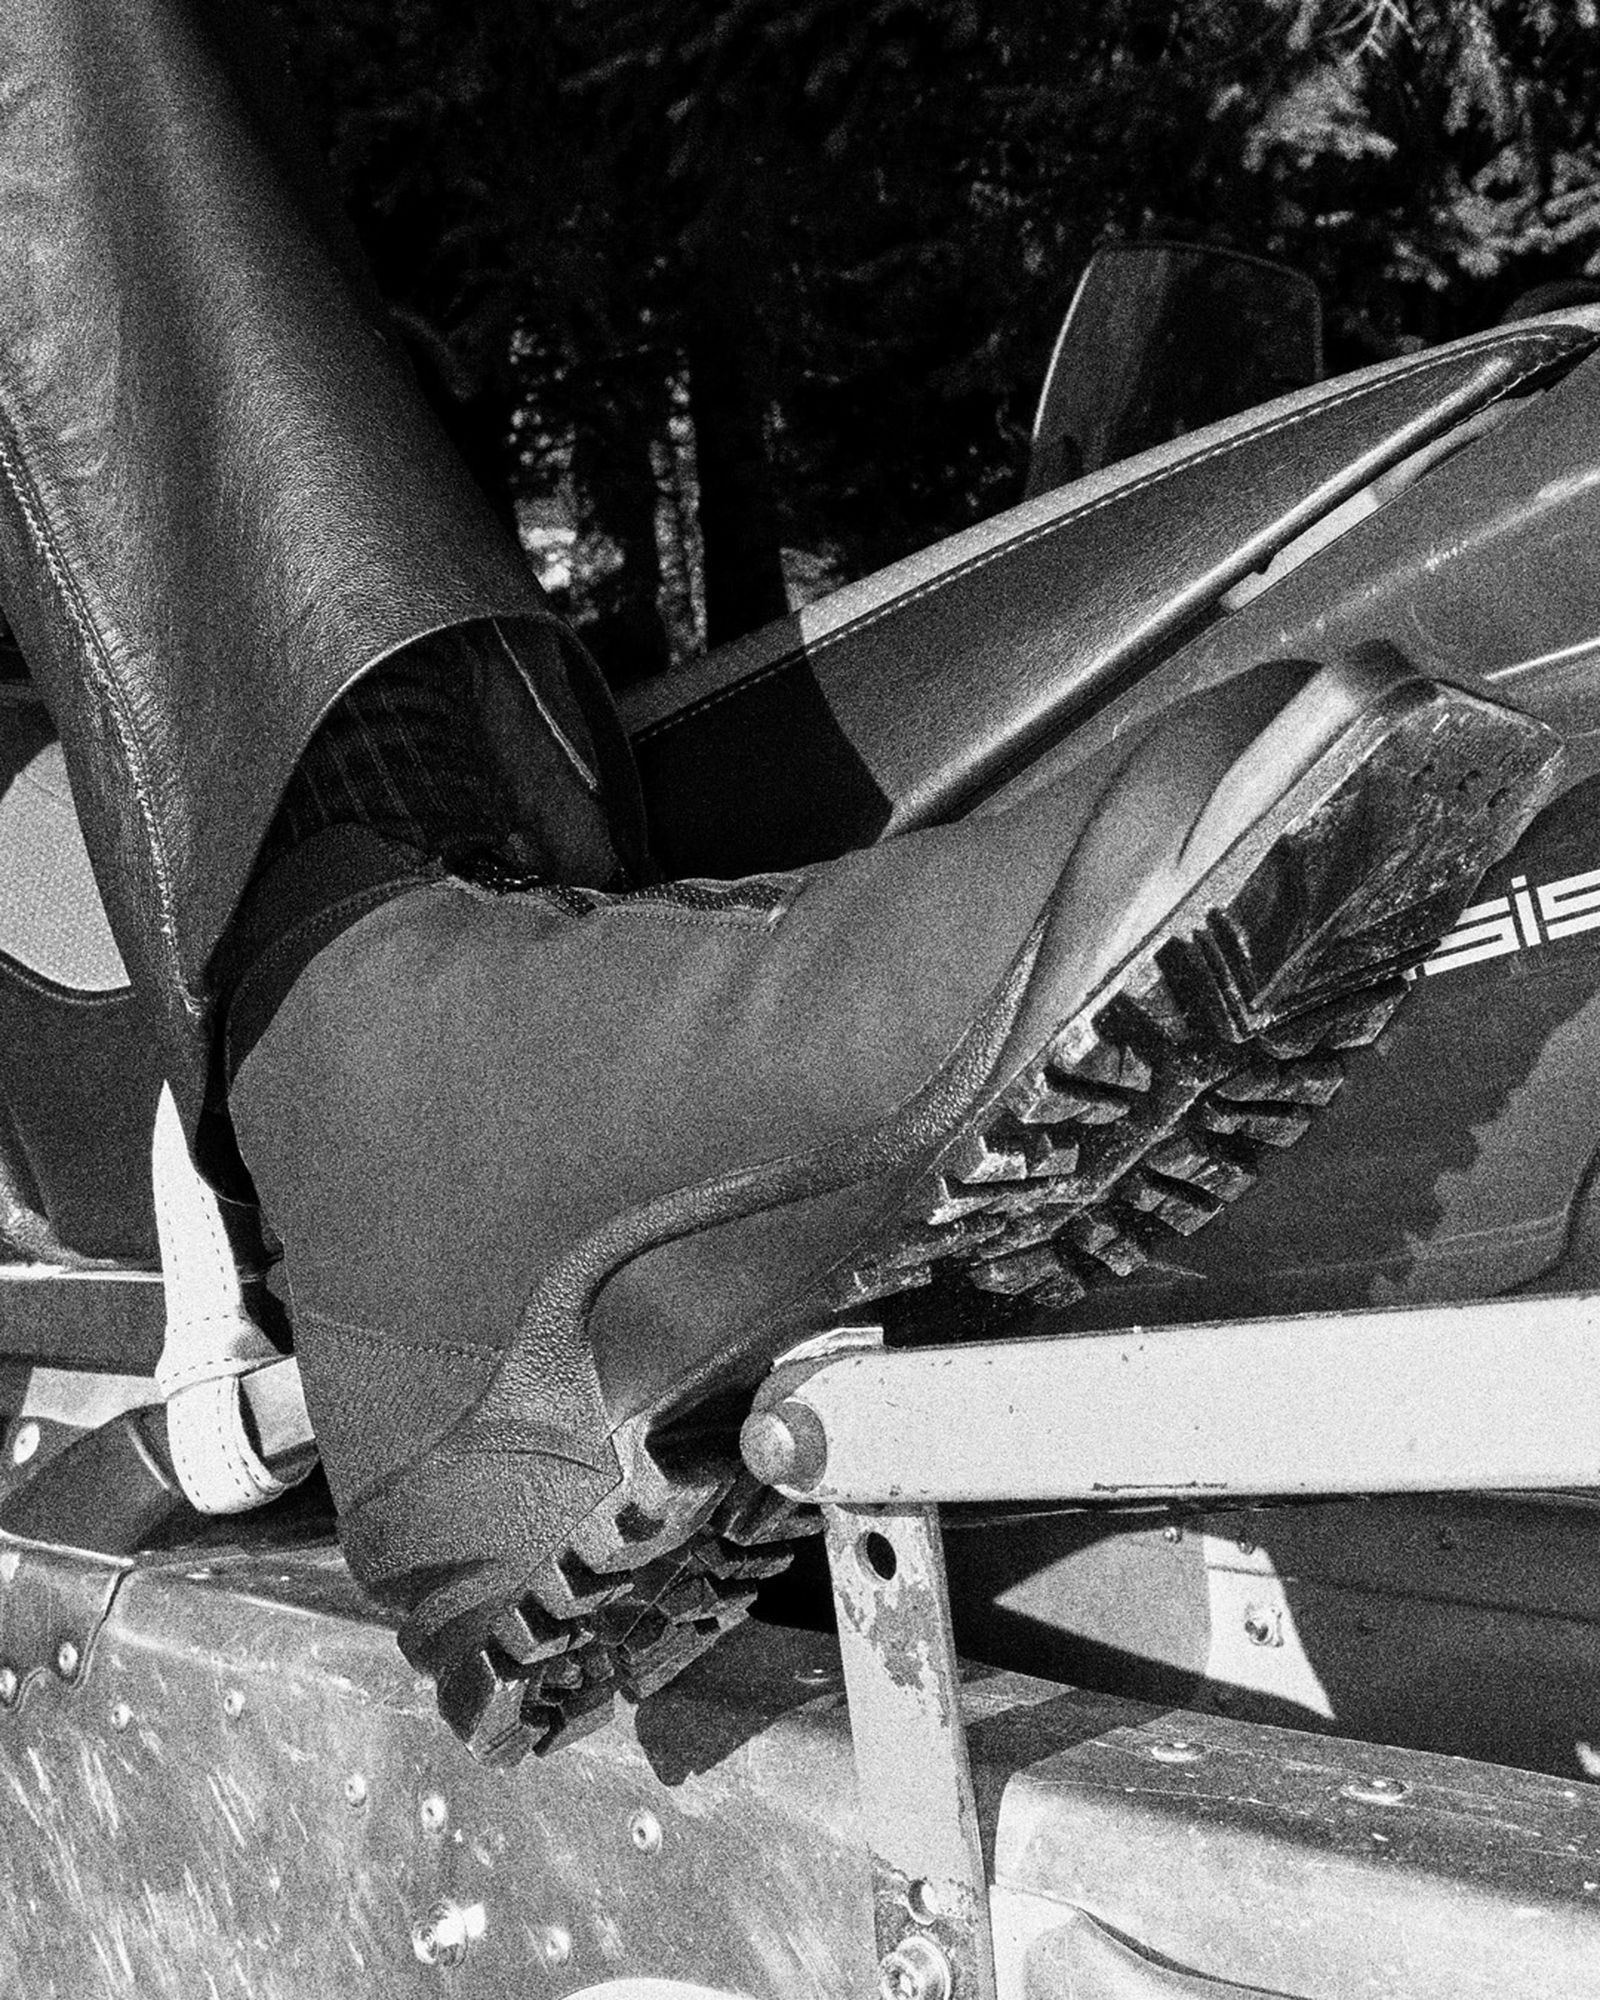 demon-hiking-footwear-interview-09